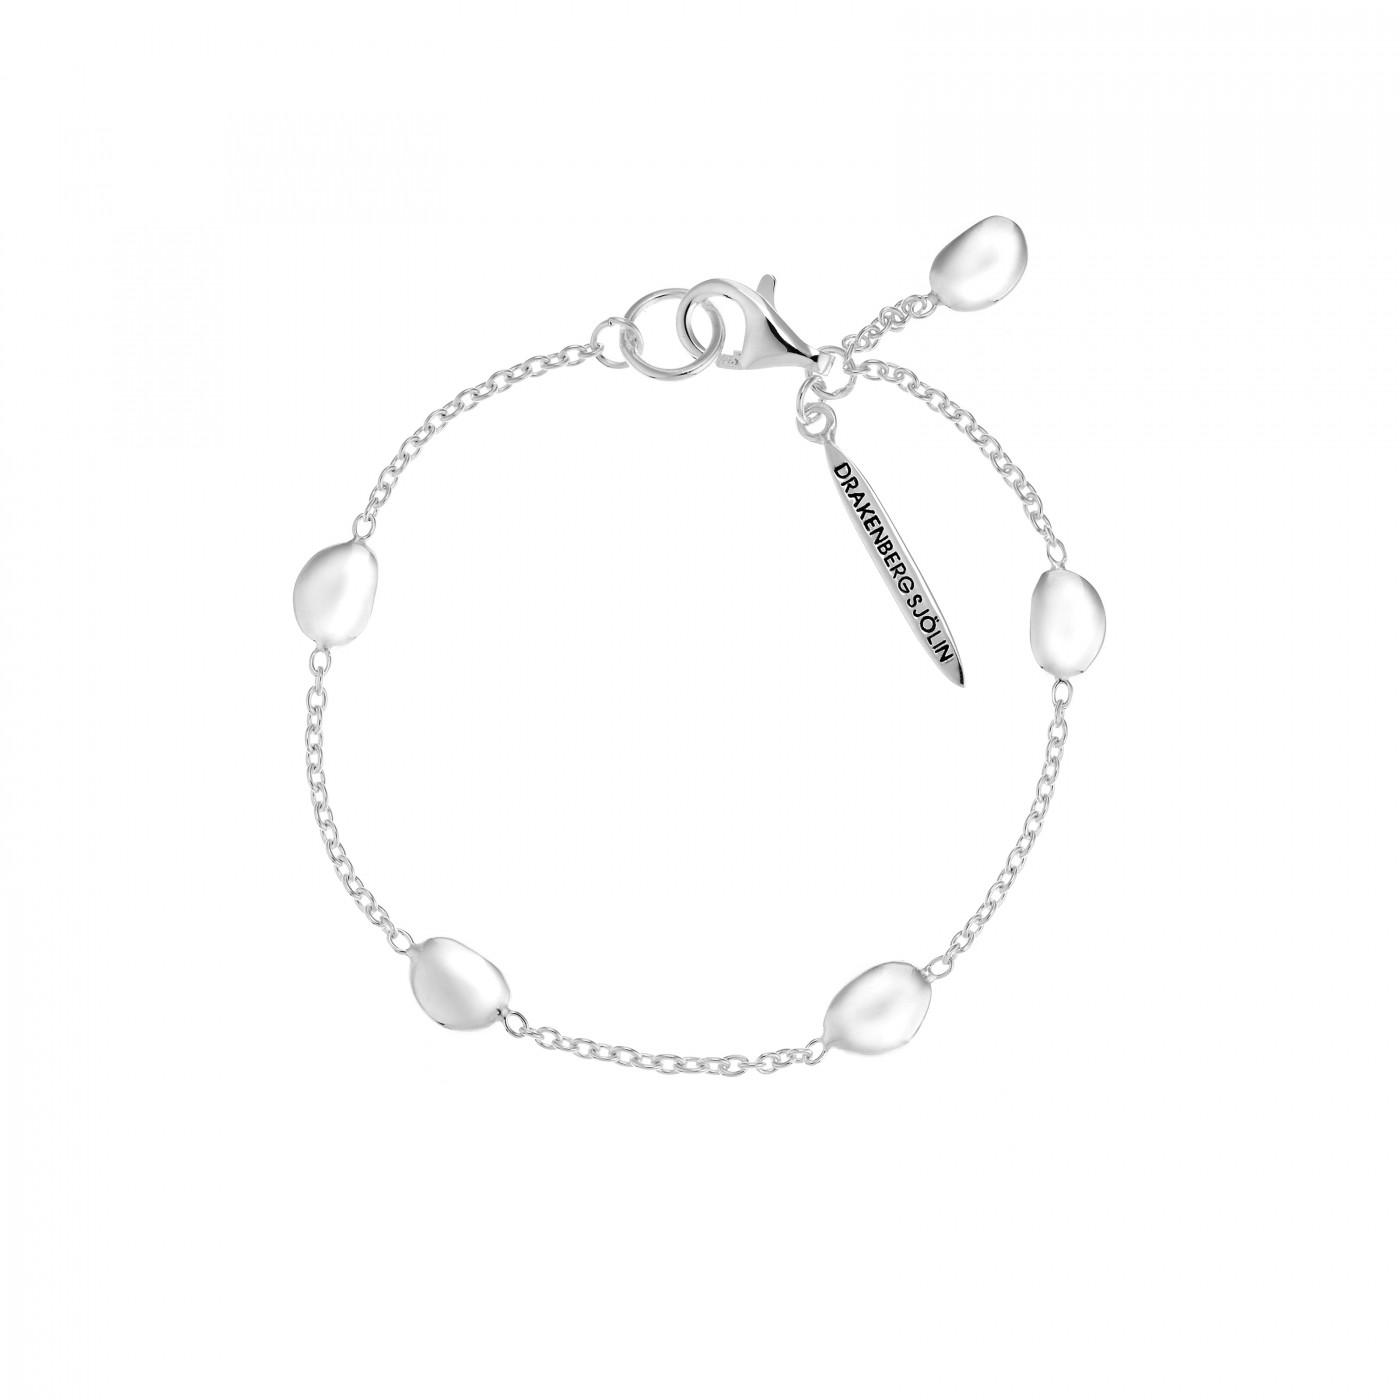 Morning-Dew-bracelet-1400x1400